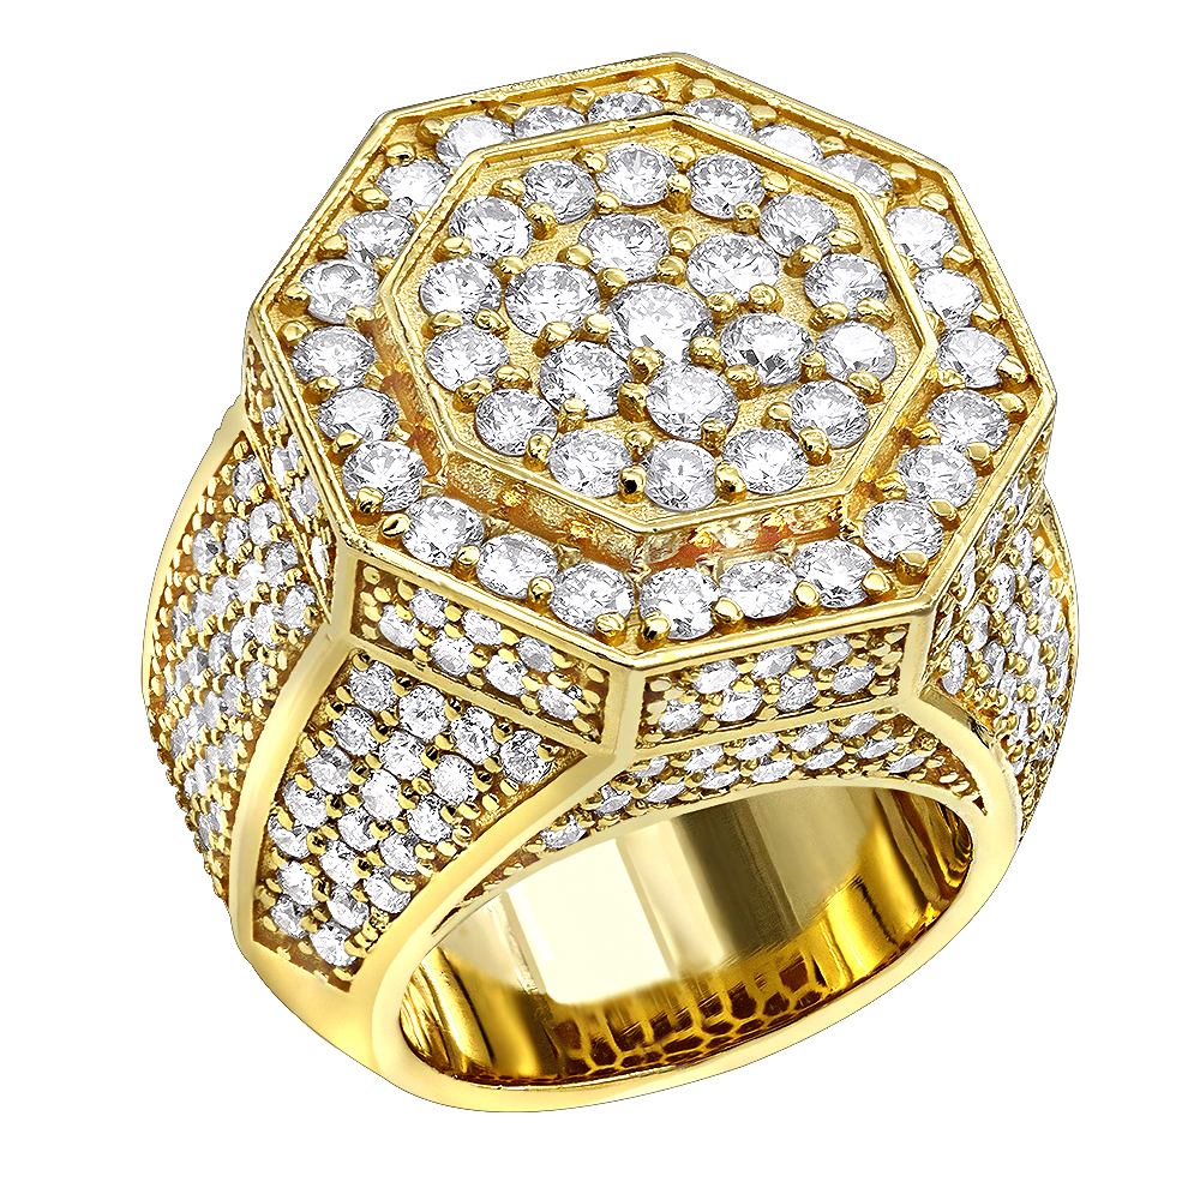 Statement Jewelry 14k Gold Men S Diamond Ring 7ct By Luxurman